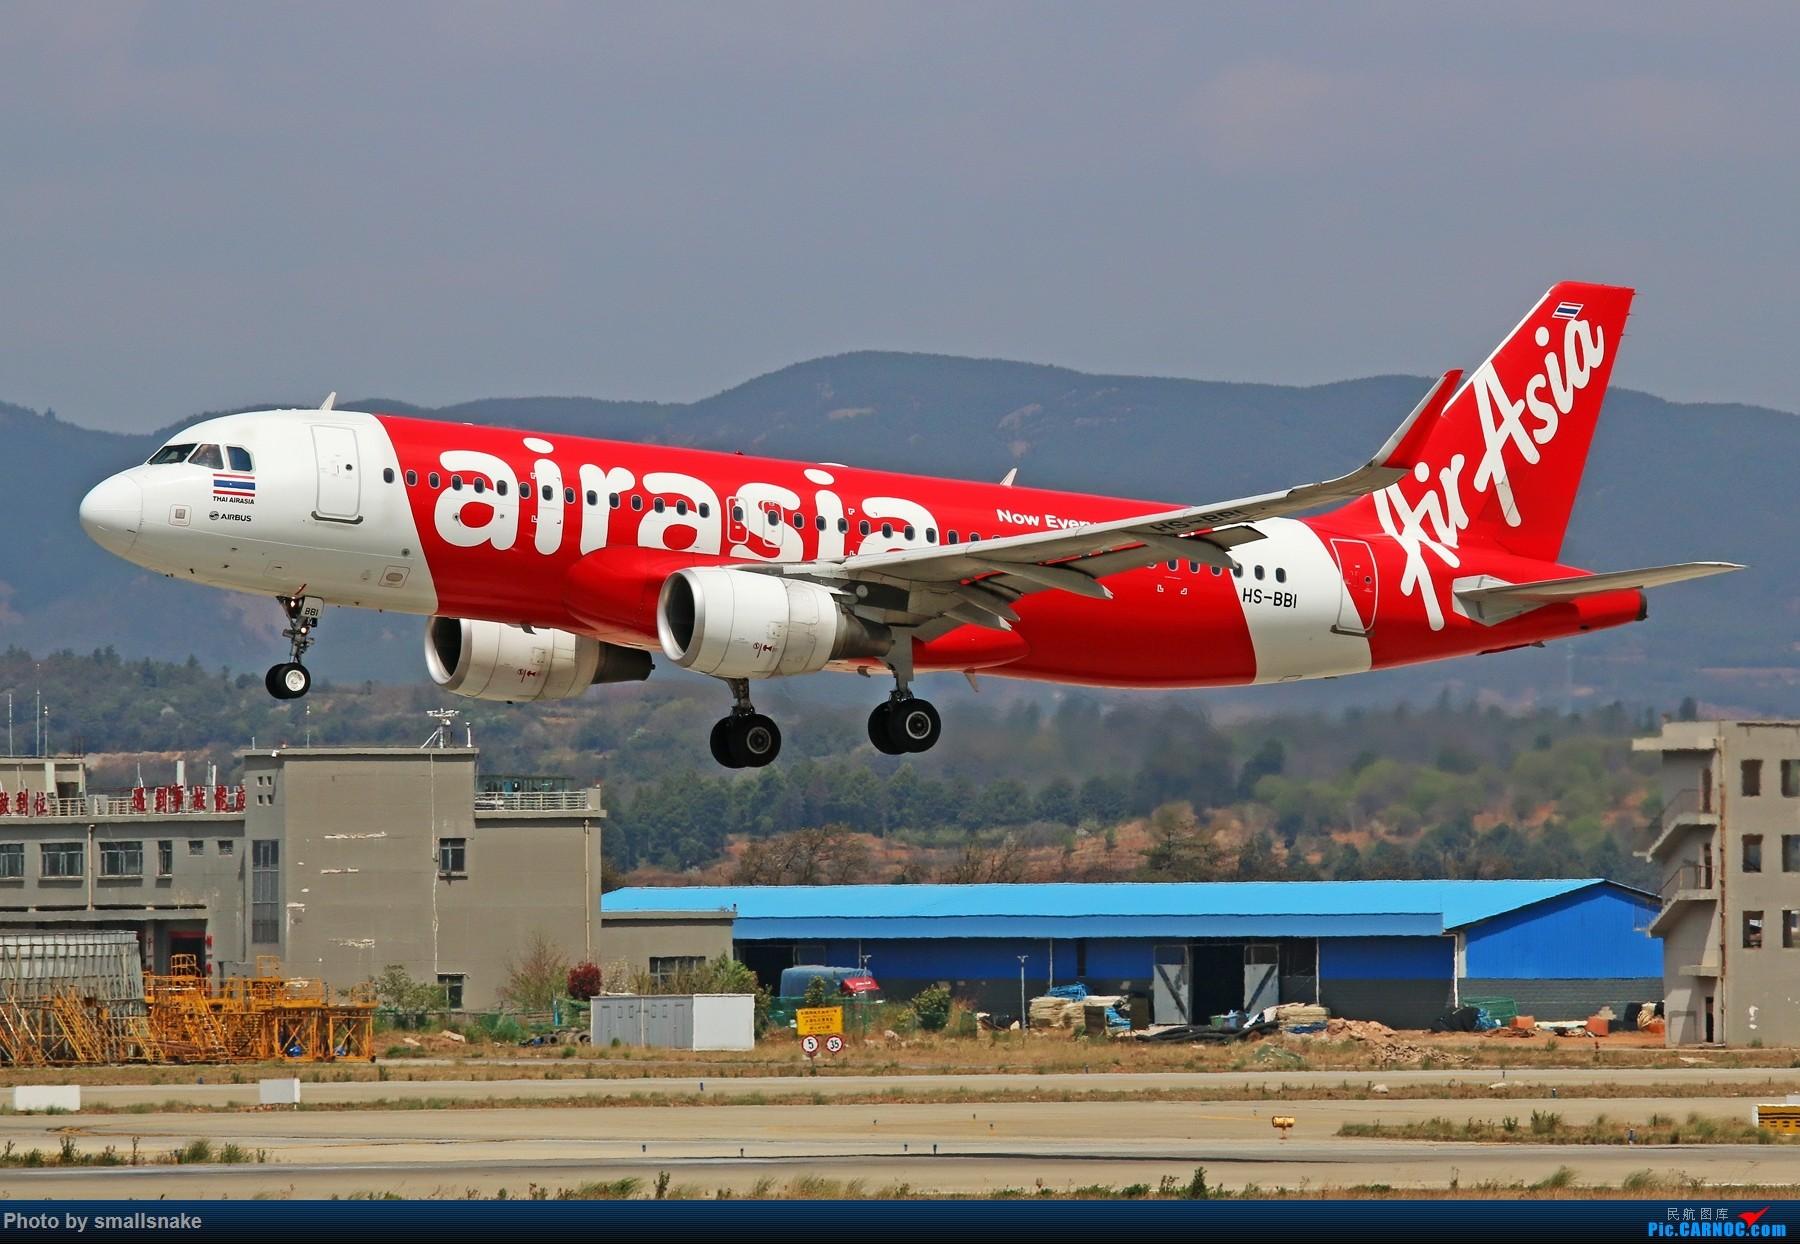 Re:[原创]KMG打卡... AIRBUS A320-200 HS-BBI 昆明长水国际机场